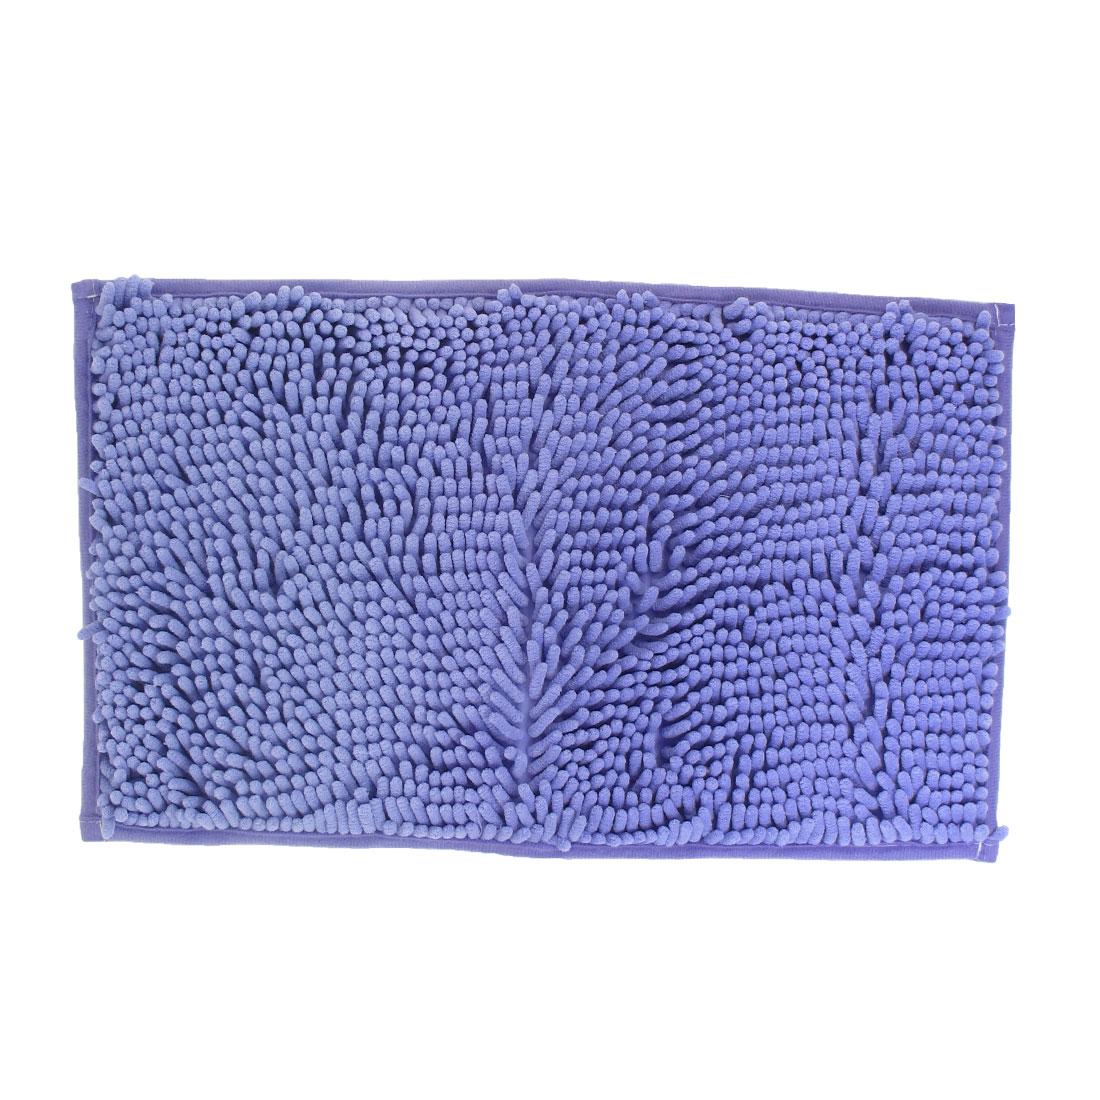 30cm x 50cm Rectangle Shape Light Purple Bedroom Hallway Nonslip Area Rug Carpet